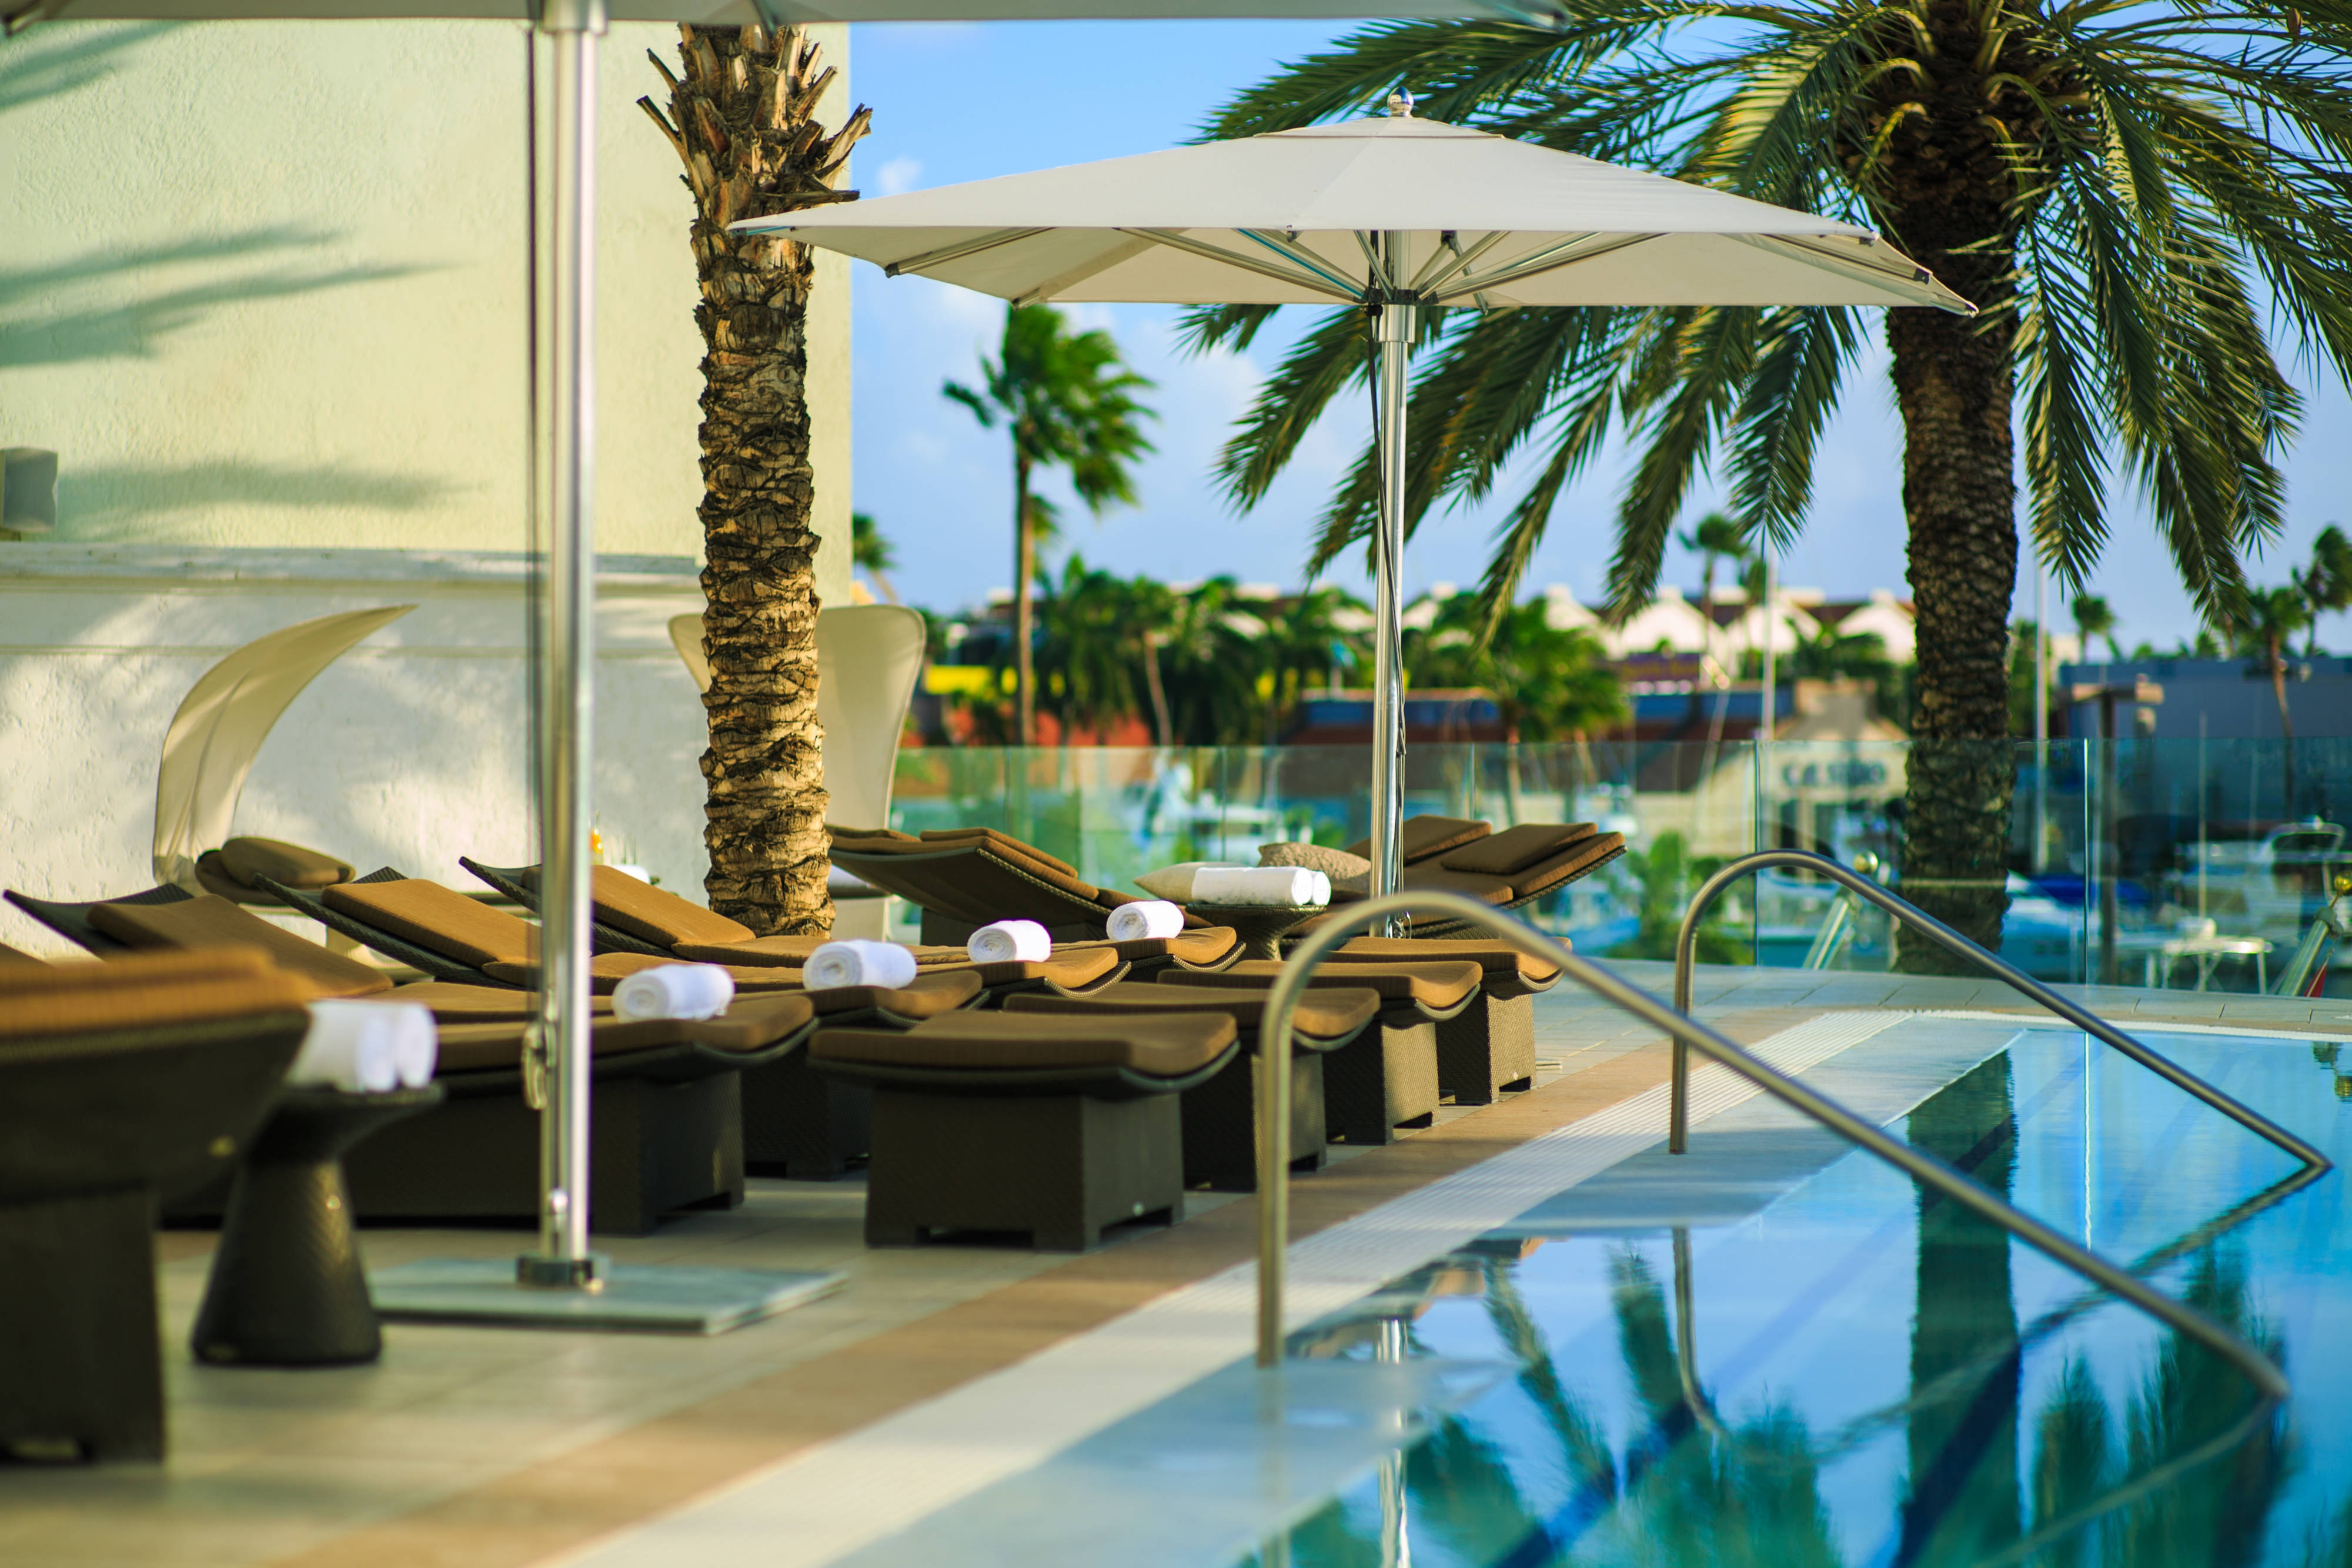 Aruba Luxury Hotels  Renaissance  Top Resorts In Aruba